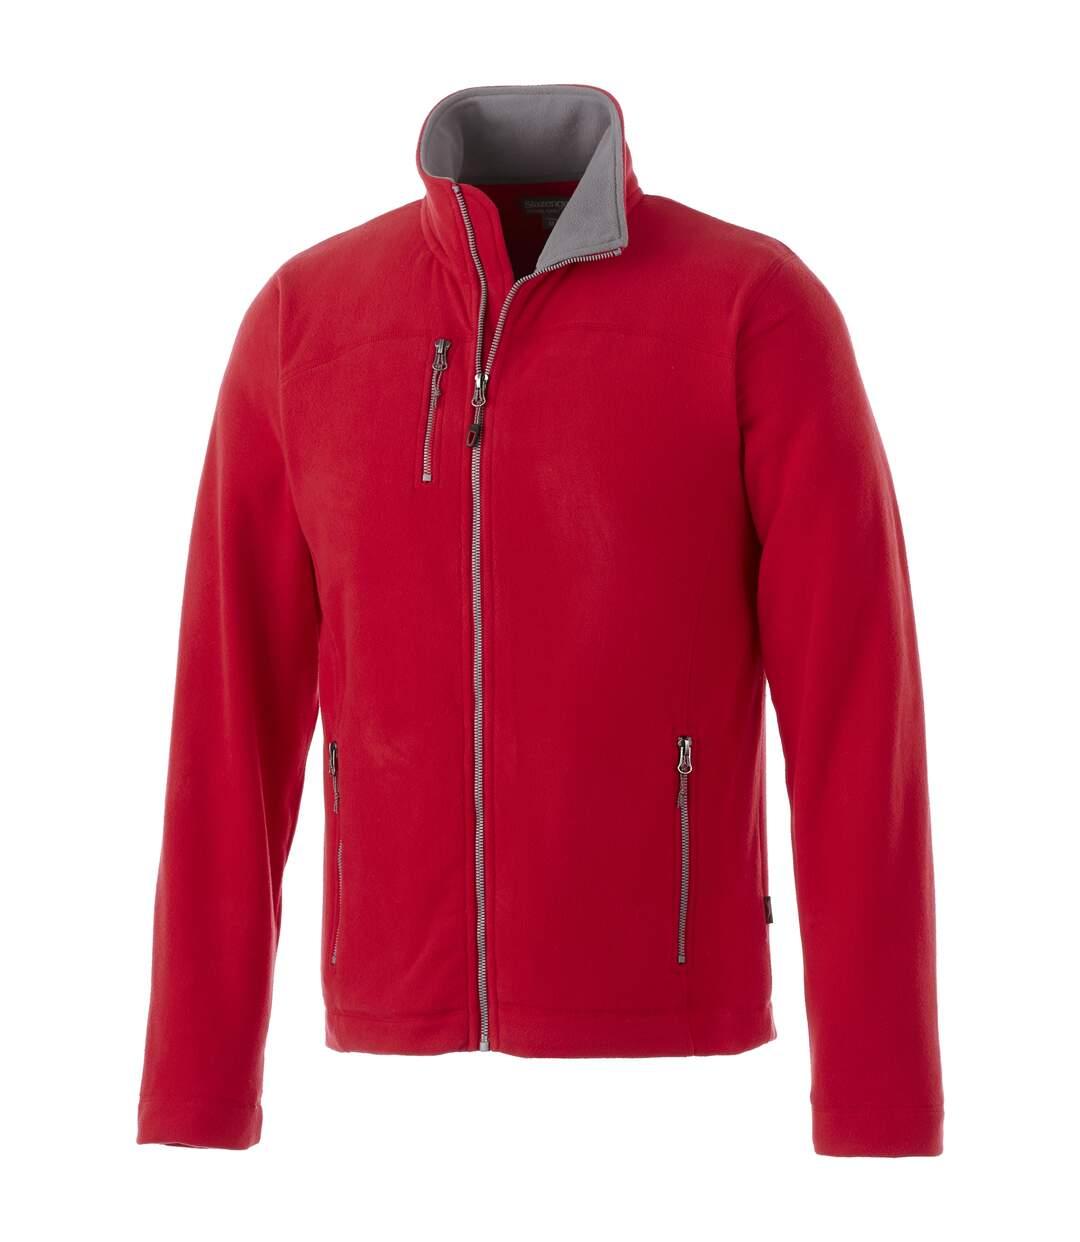 Slazenger Mens Pitch Microfleece Jacket (Navy) - UTPF1797